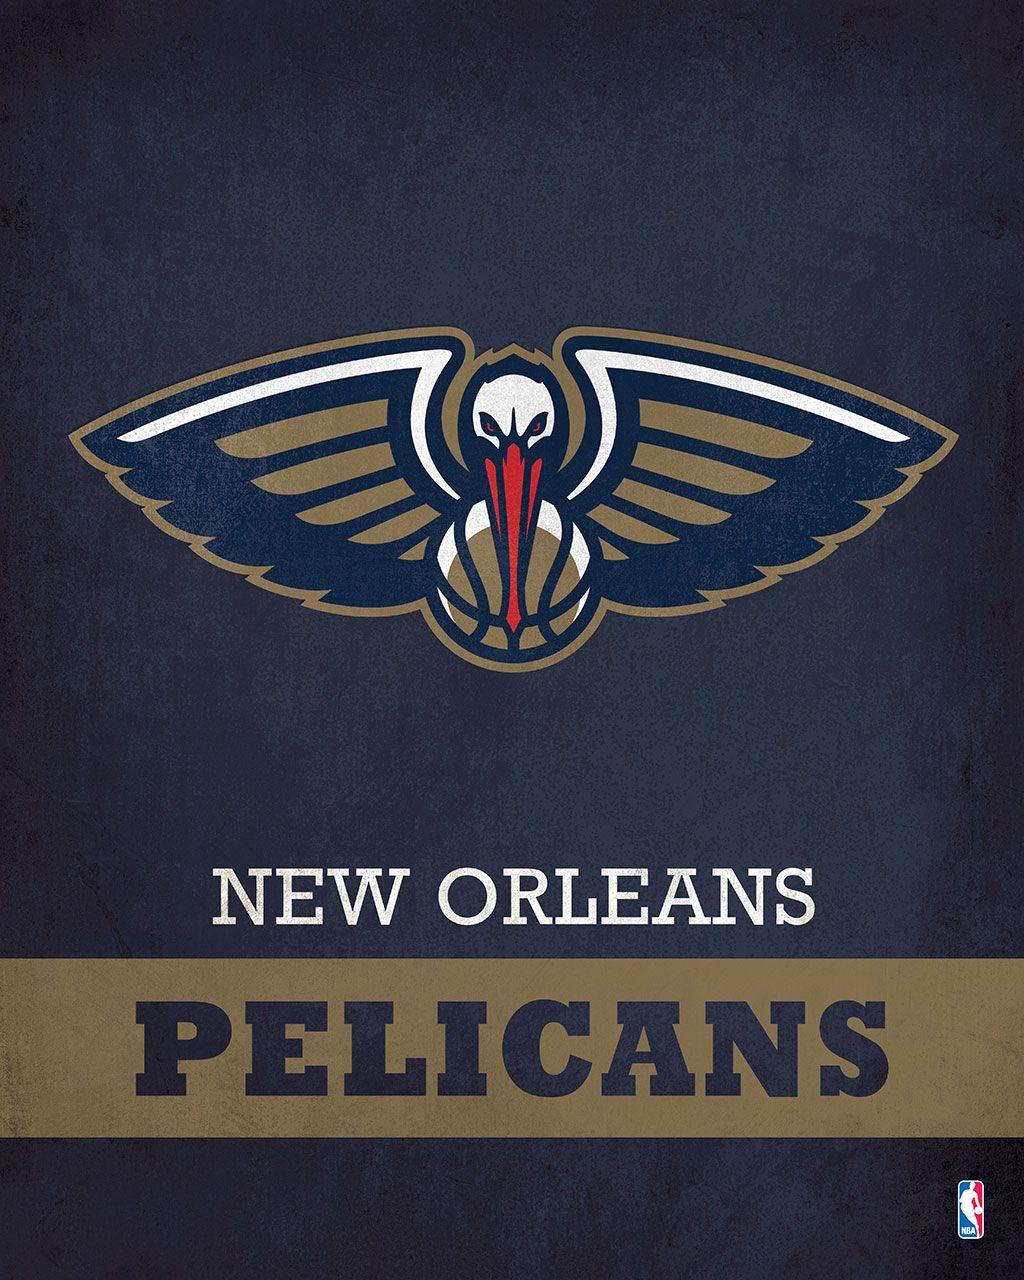 47 New Orleans Pelicans Wallpapers On Wallpapersafari